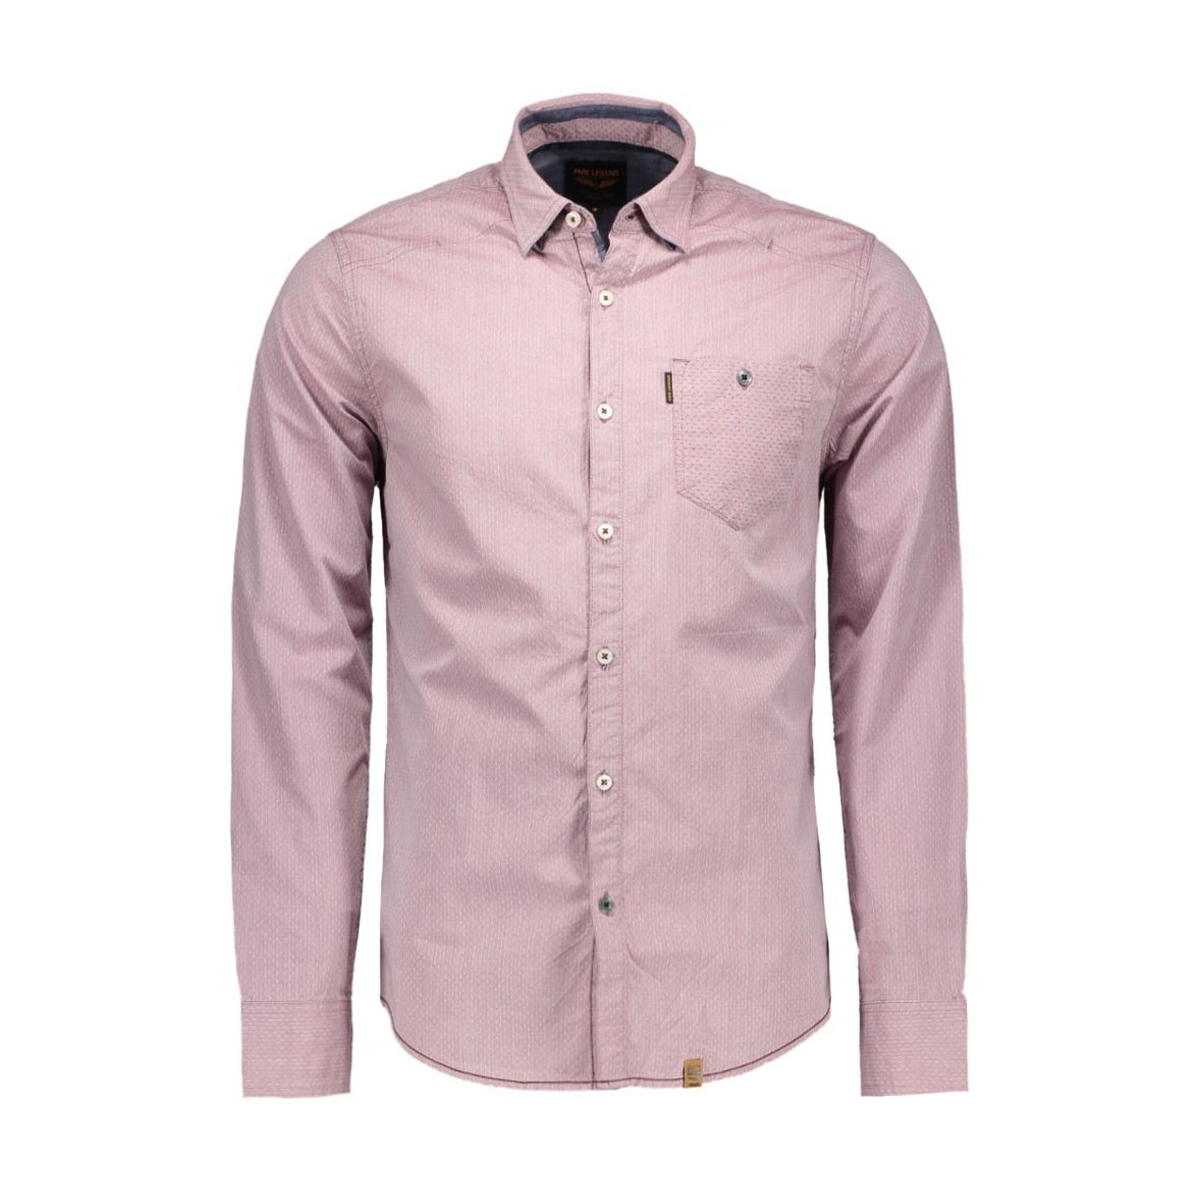 psi65224 pme legend overhemd 390